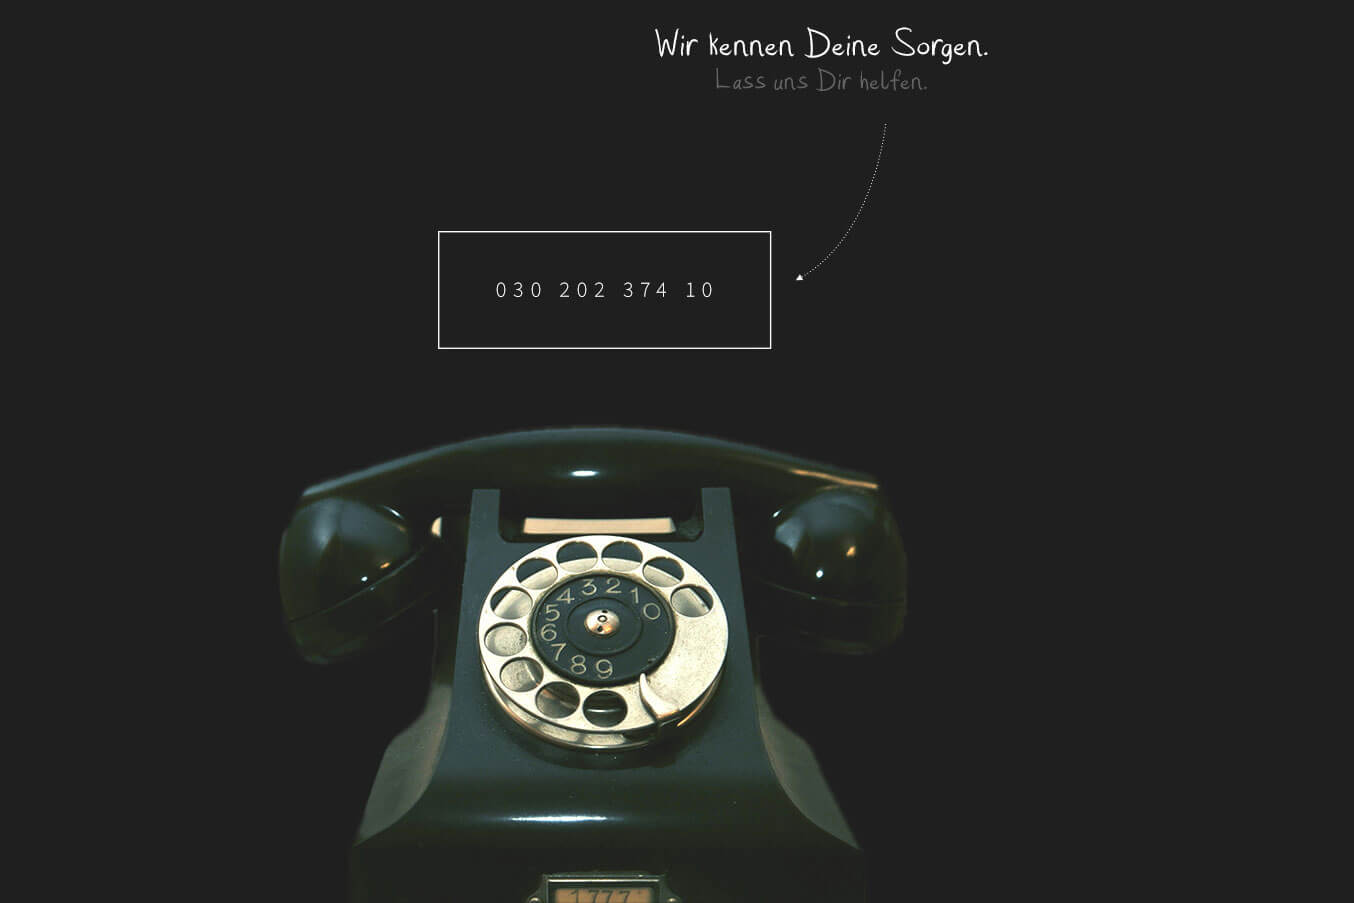 Ring, ring, ring: Das Startup-Telefon bietet Gründertipps